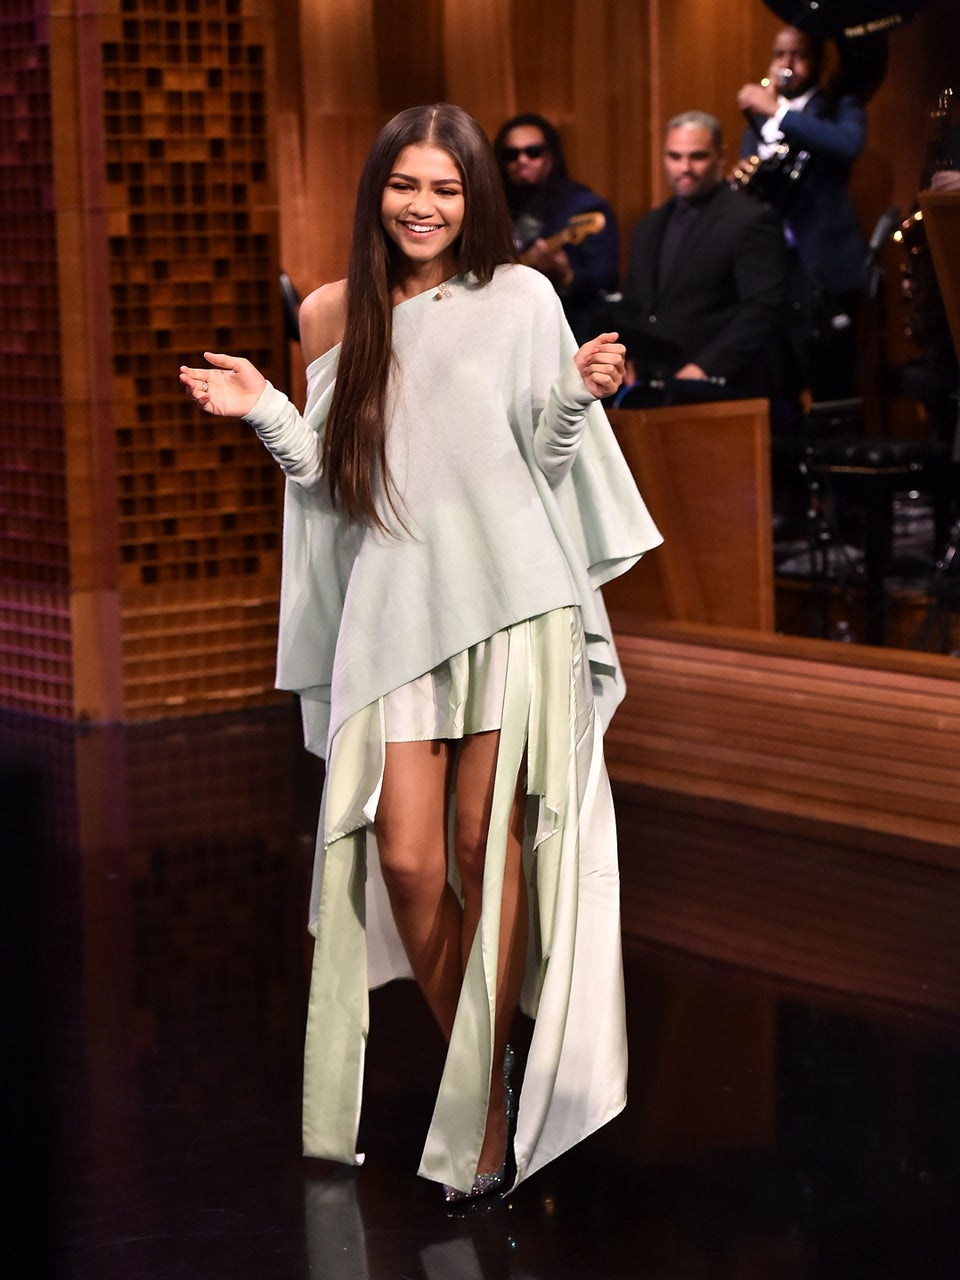 Zendaya's 'Spiderman: Homecoming' Press Tour Wardrobe is Just Way Too Good